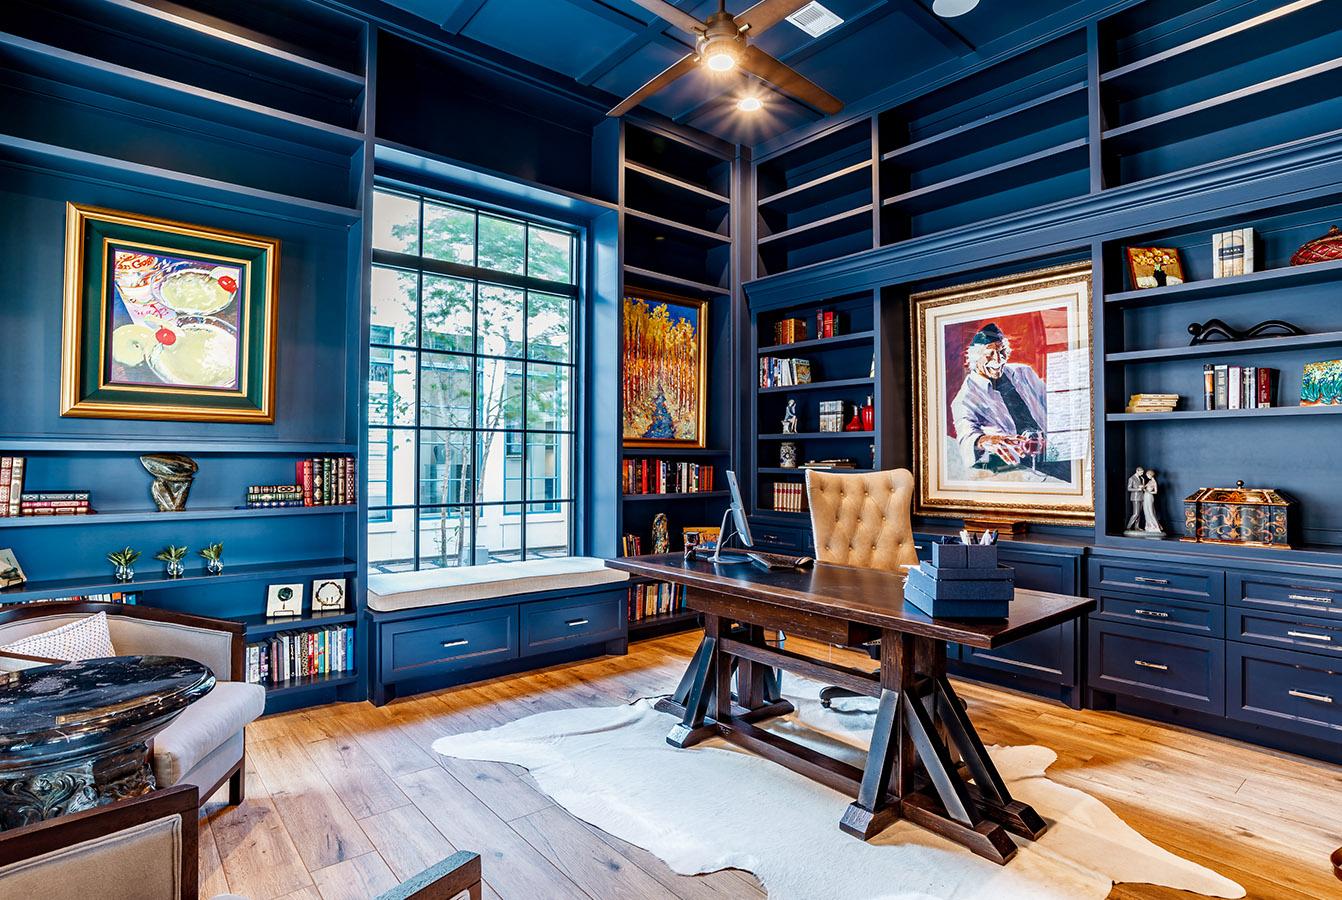 William David Colorful Office